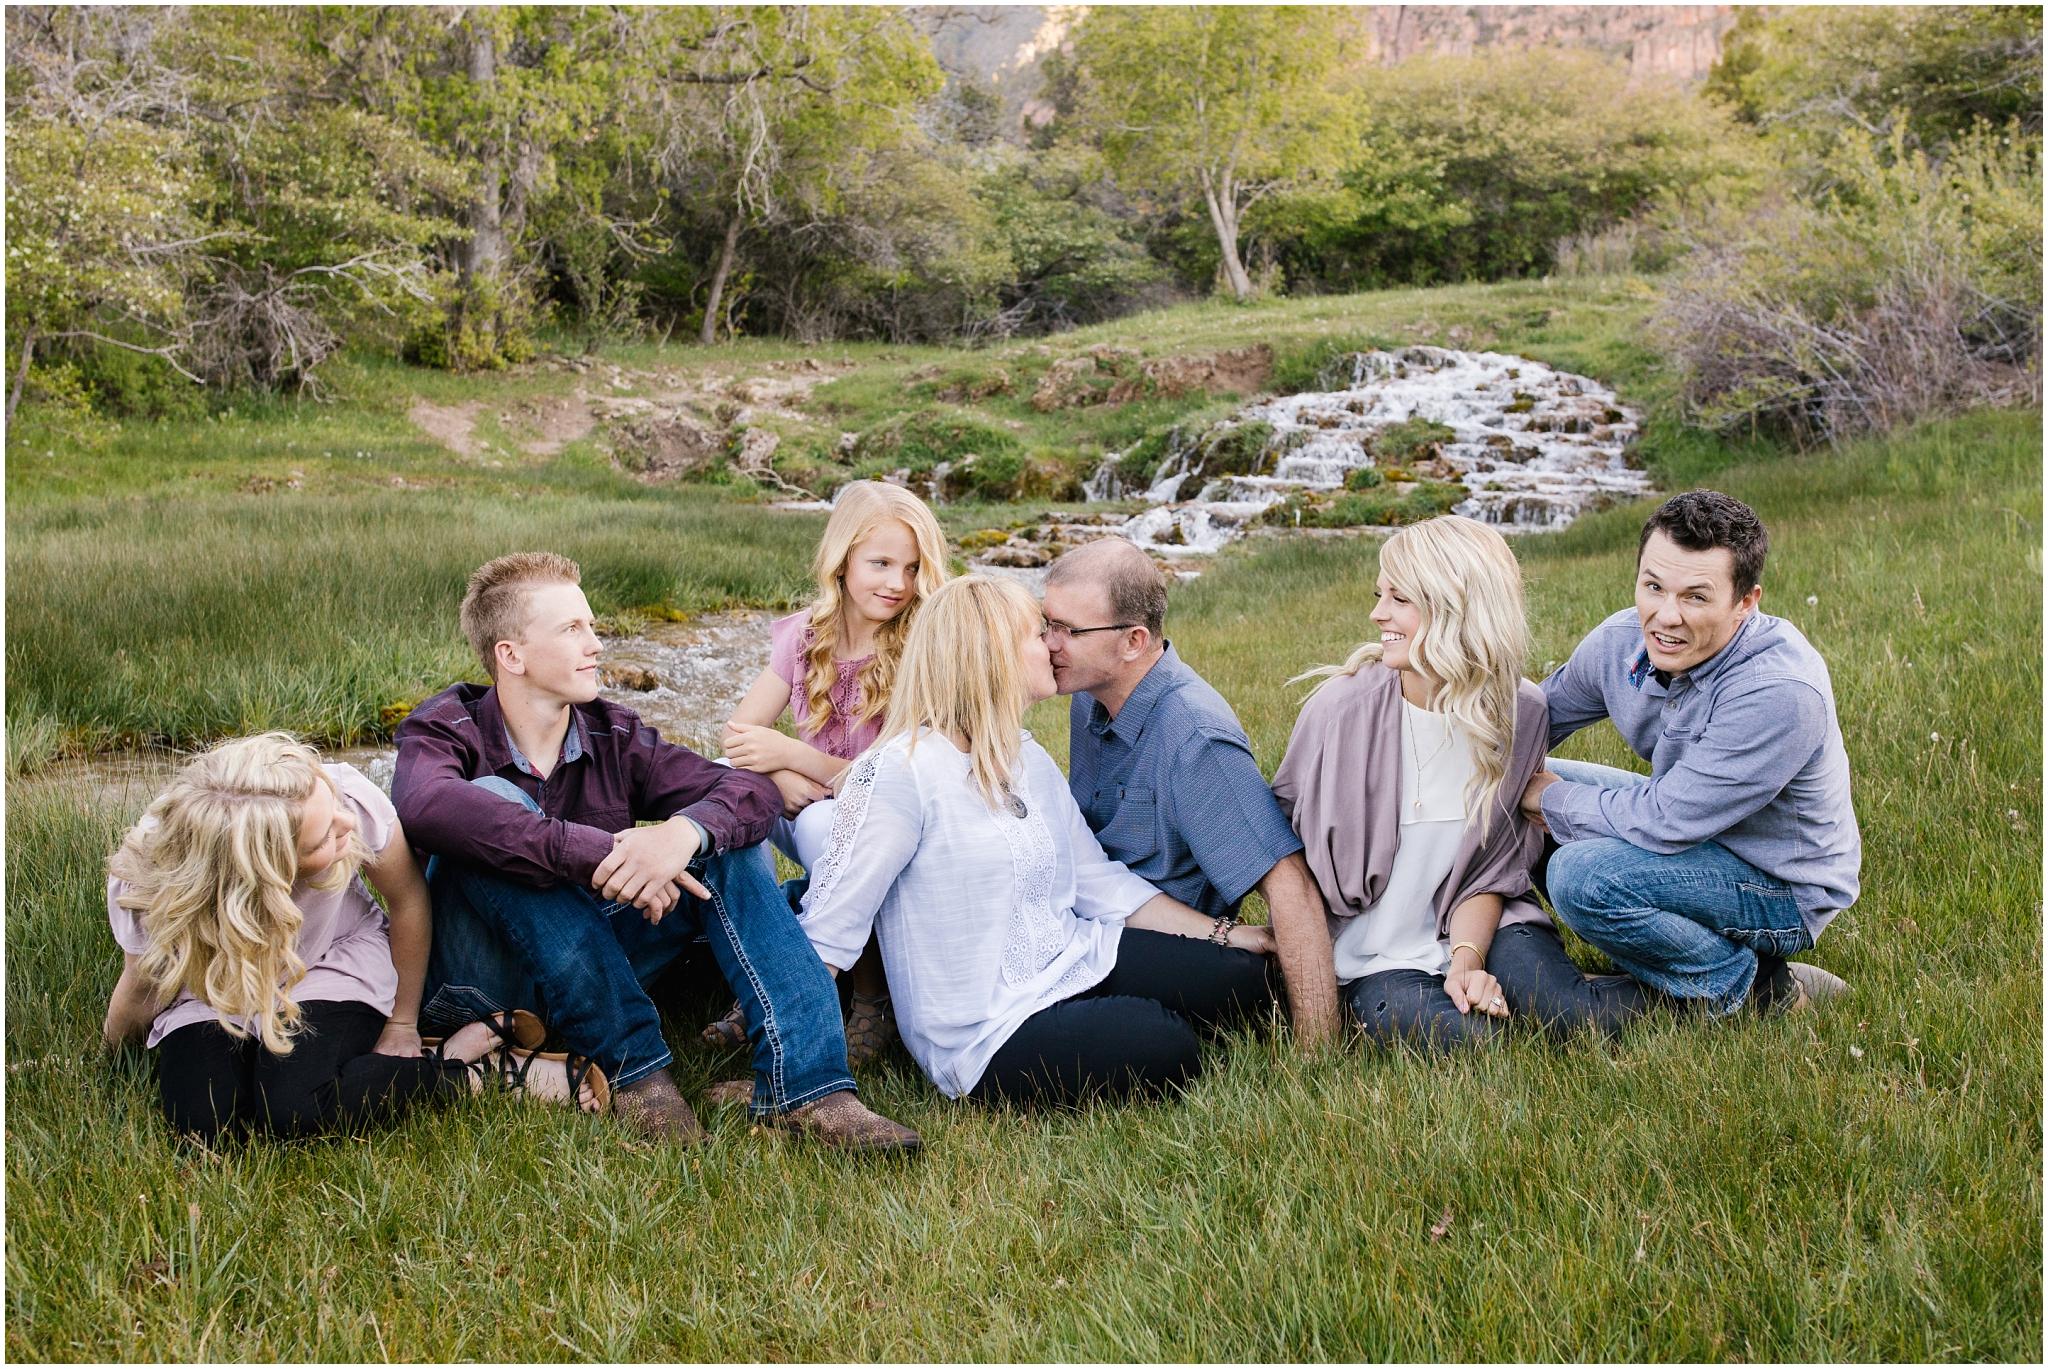 Bagley-100_Lizzie-B-Imagery-Utah-Family-Photographer-Central-Utah-Photographer-Utah-County-Extended-Family.jpg